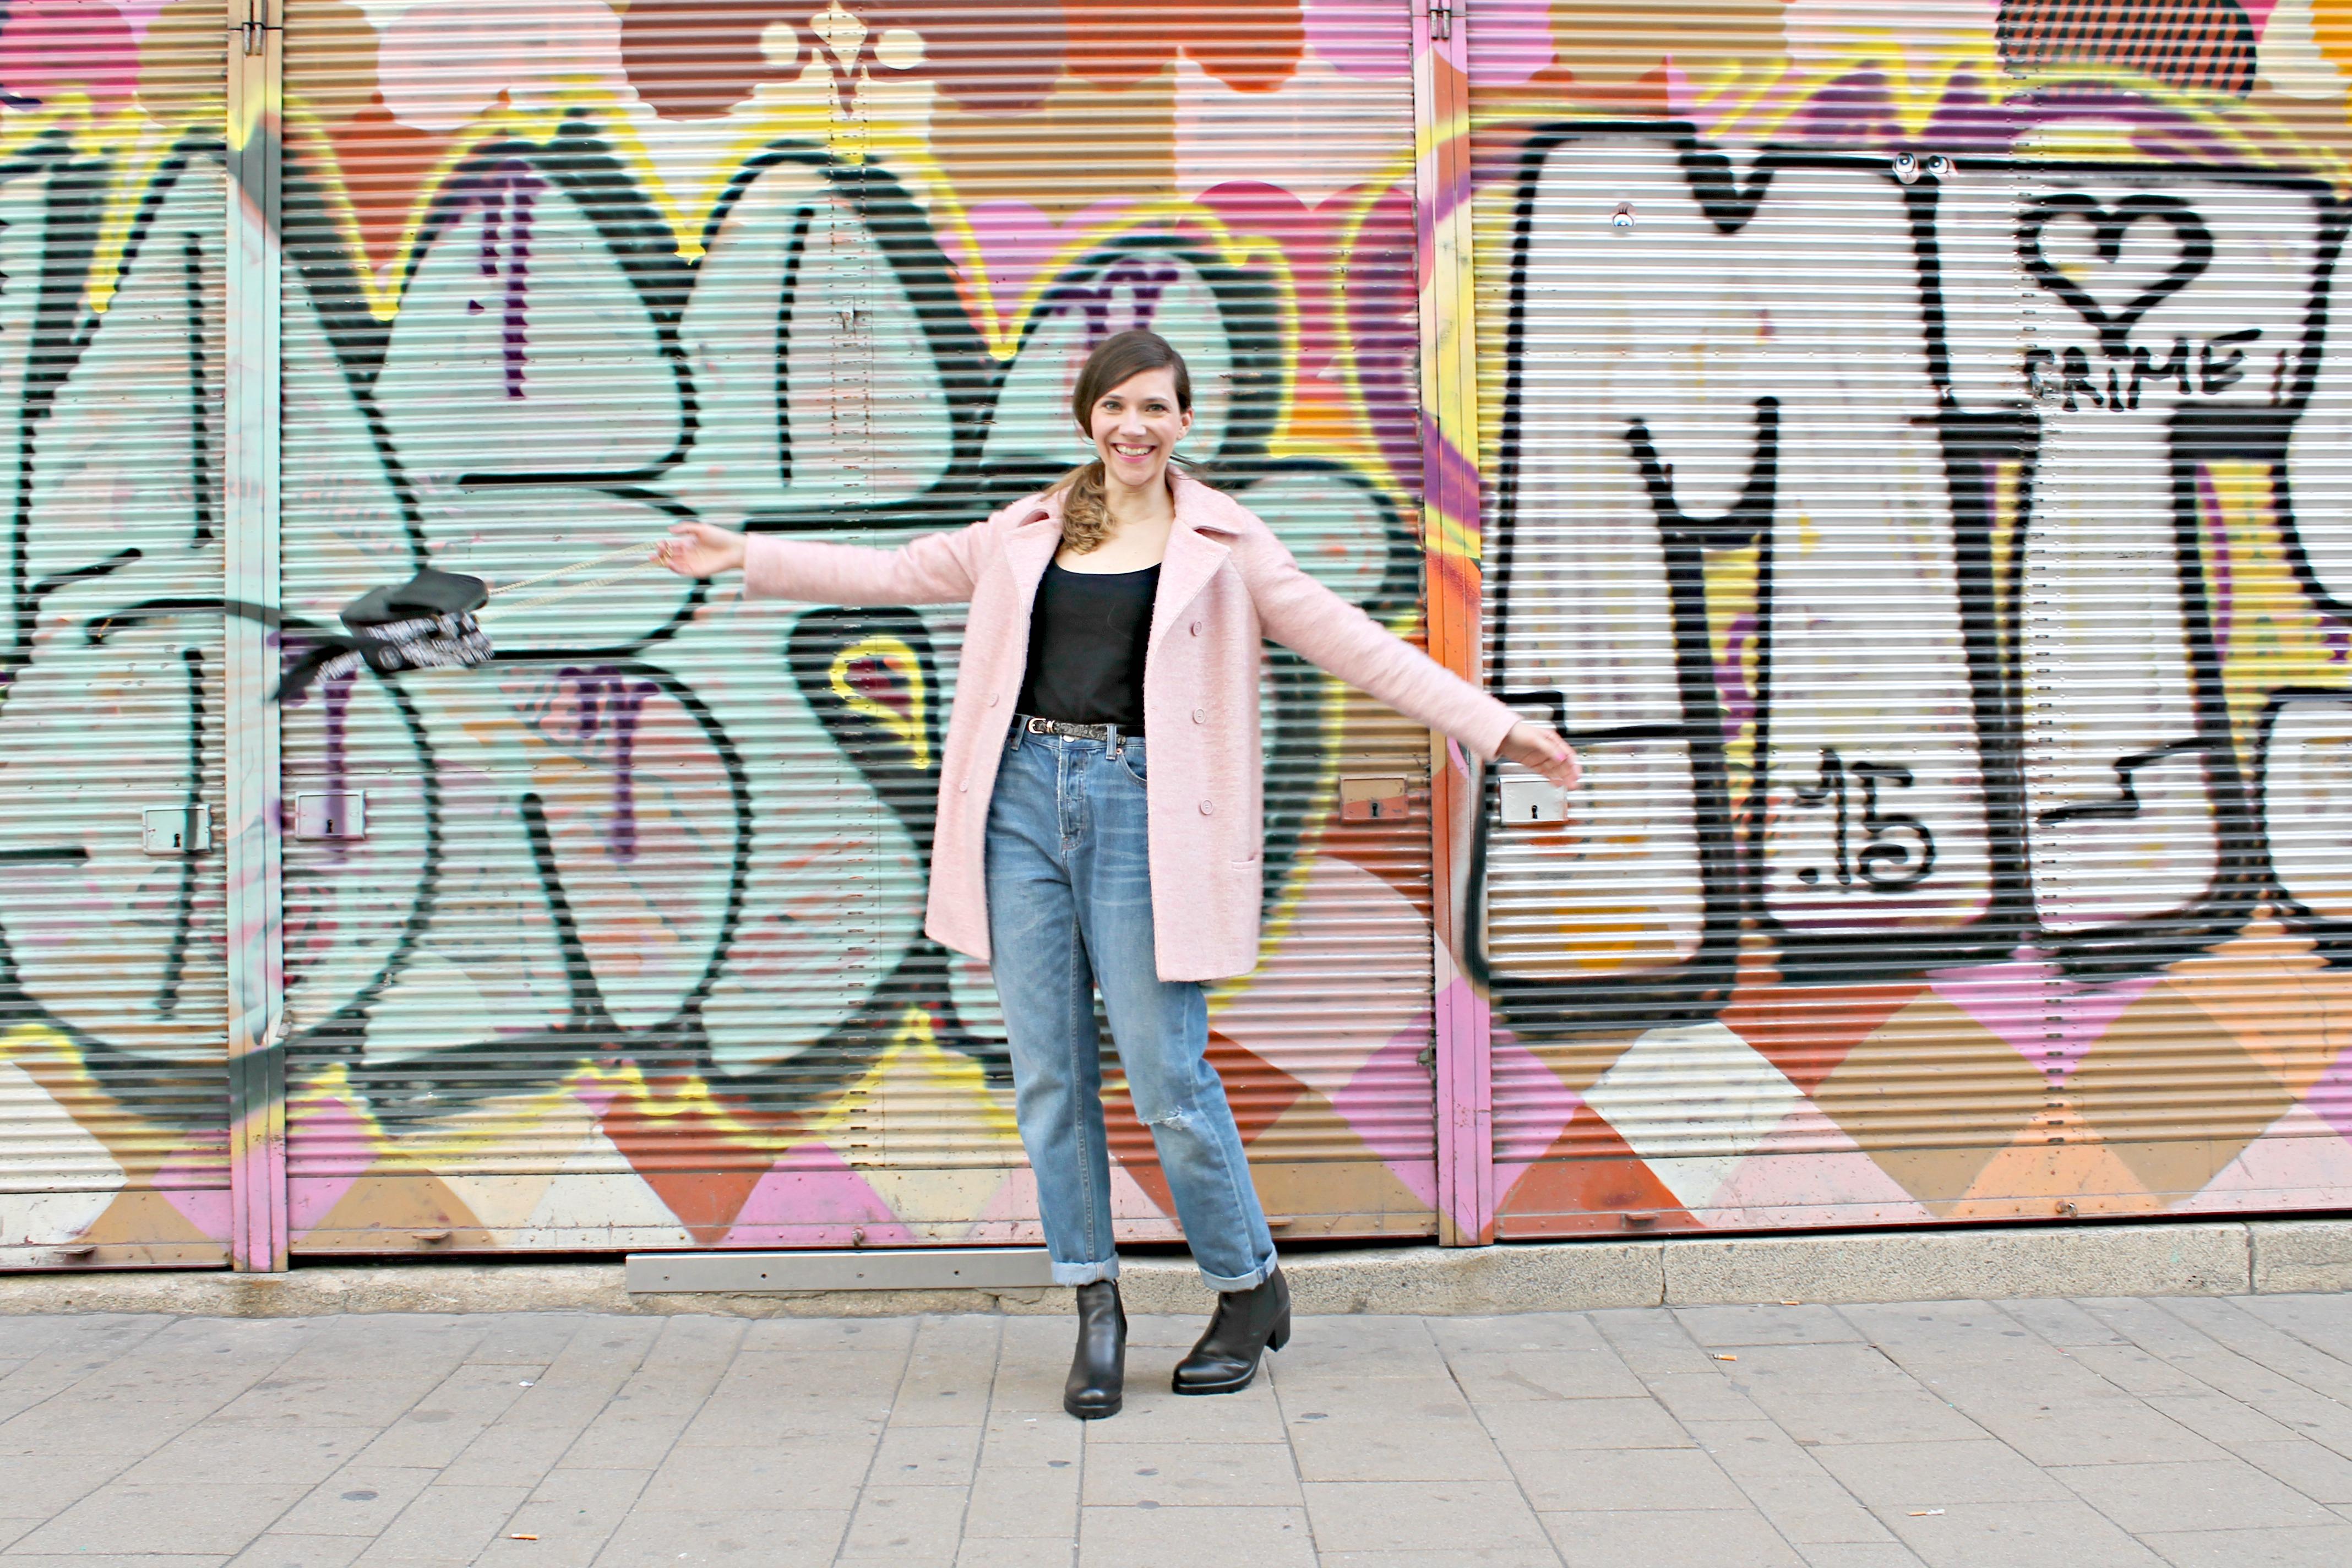 vienna fashionblog